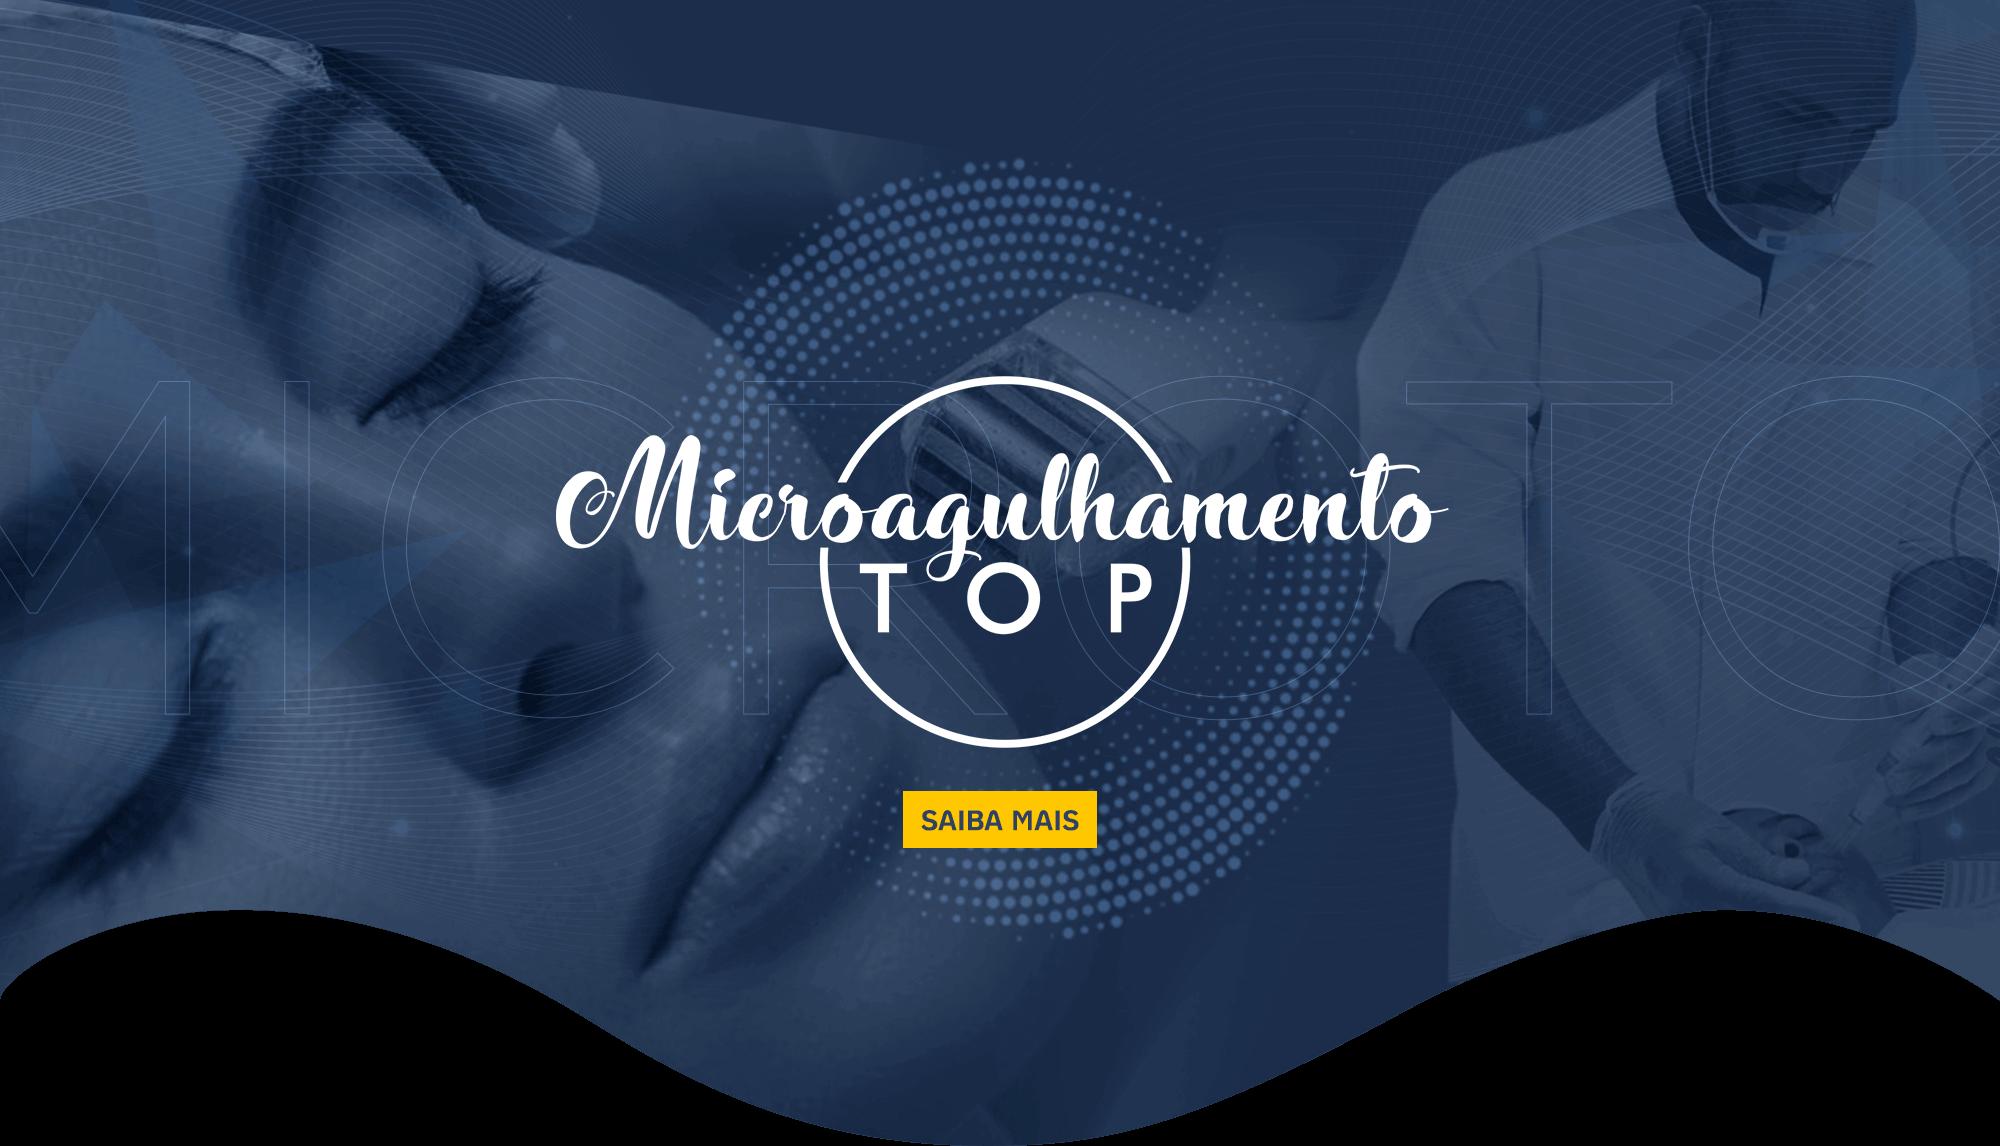 Micro Agulhamento Top